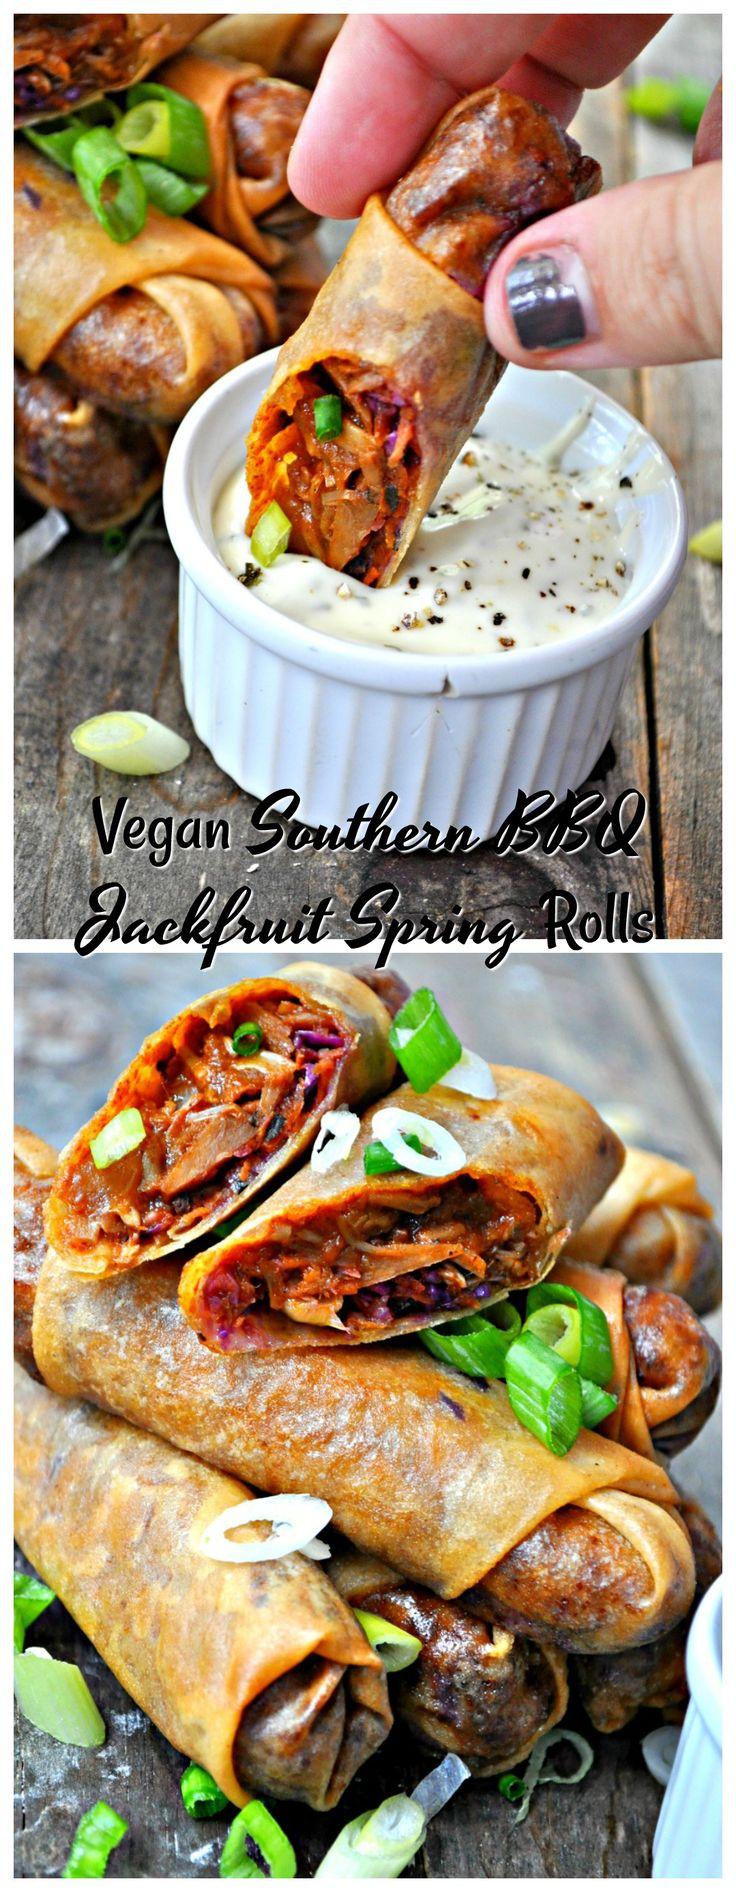 Vegan Southern BBQ Jackfruit Spring Roll